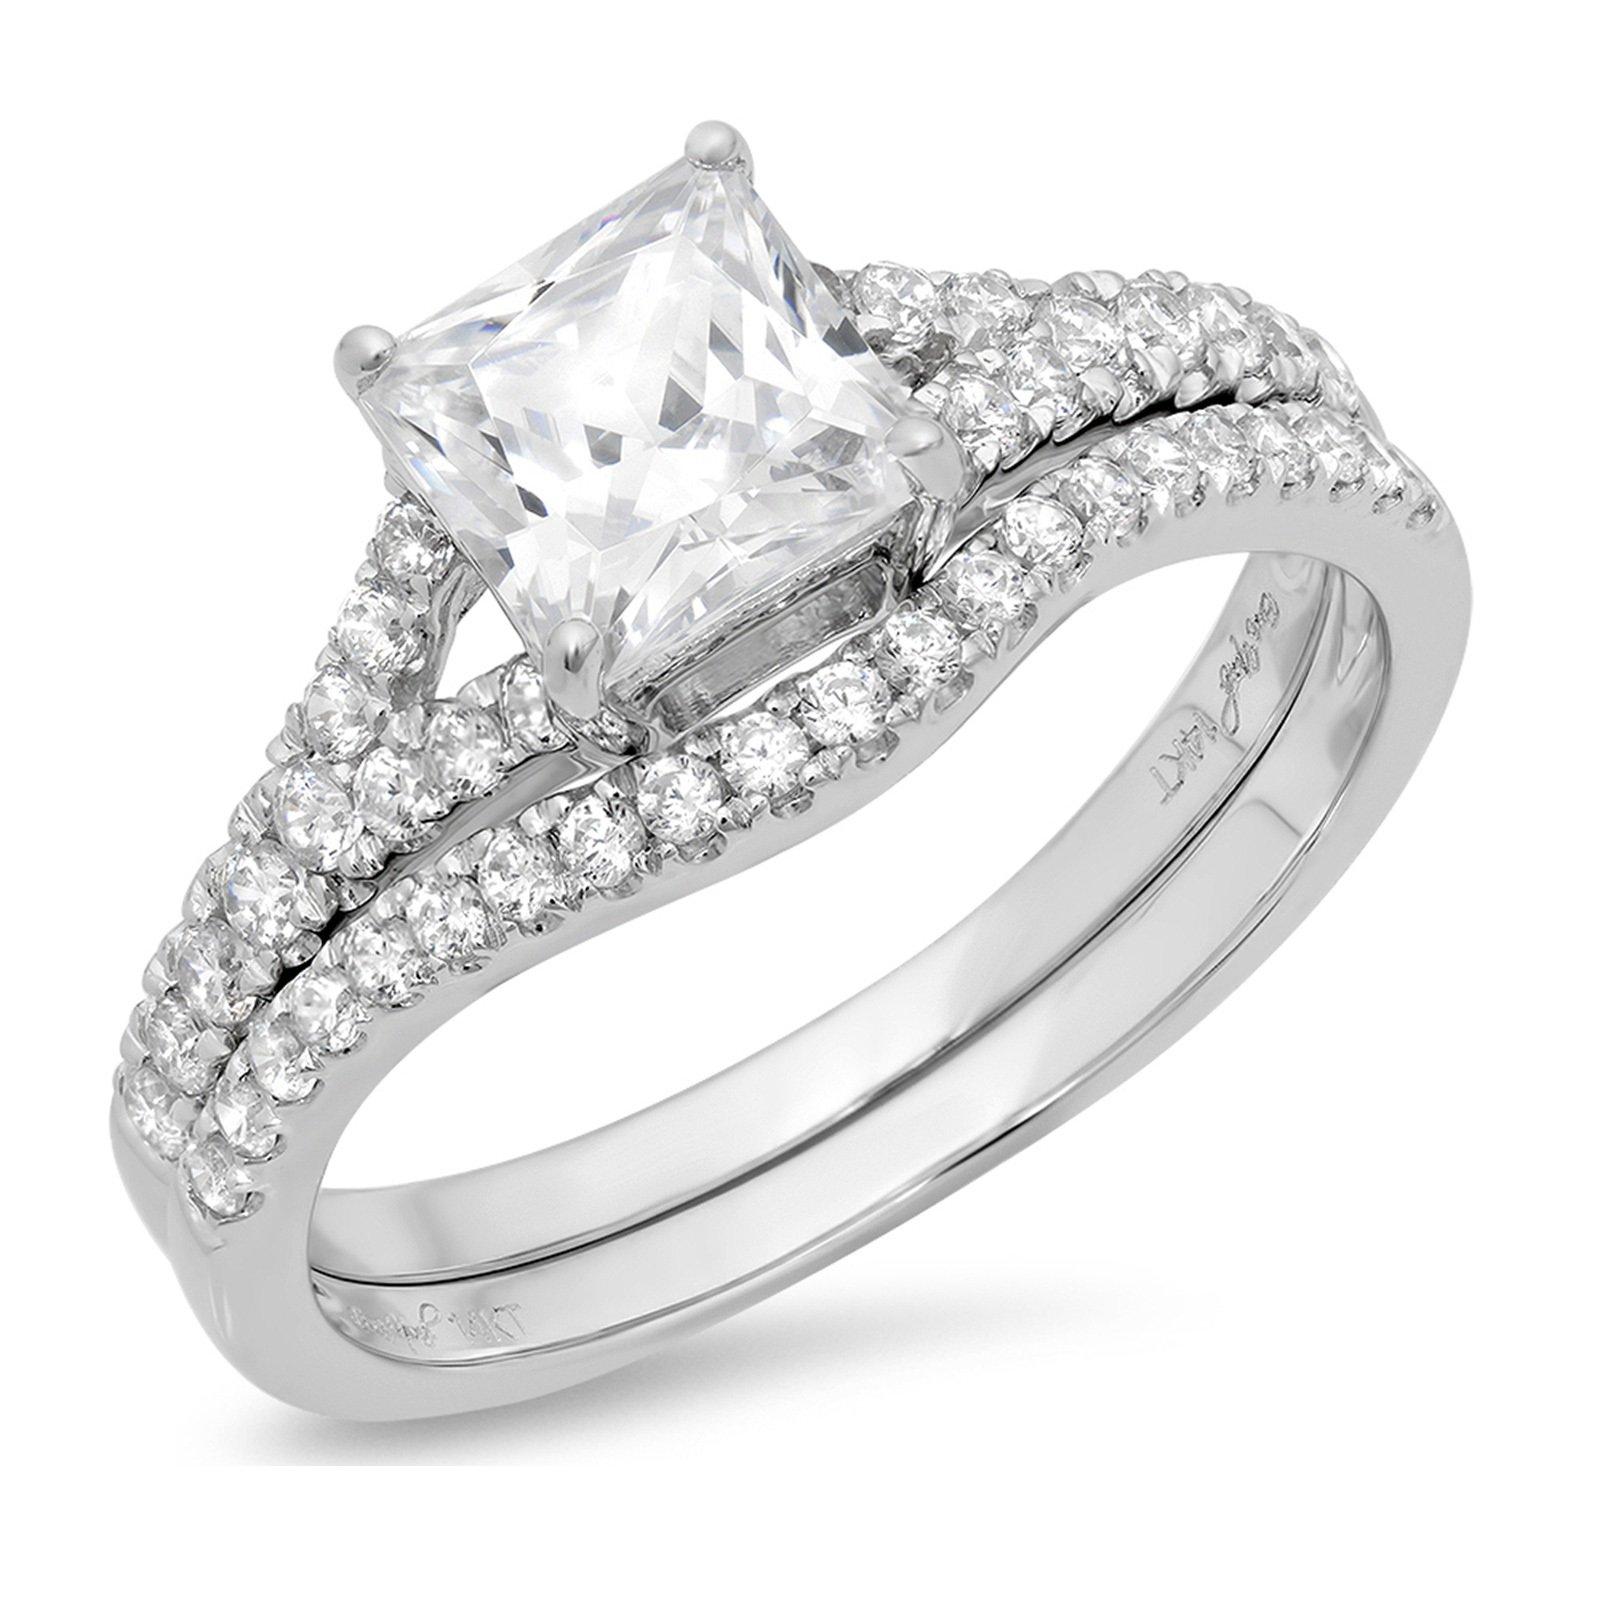 Clara Pucci 1.91 CT Princess Cut CZ Pave Halo Bridal Engagement Wedding Ring Band Set 14k White Gold, Size 8.5